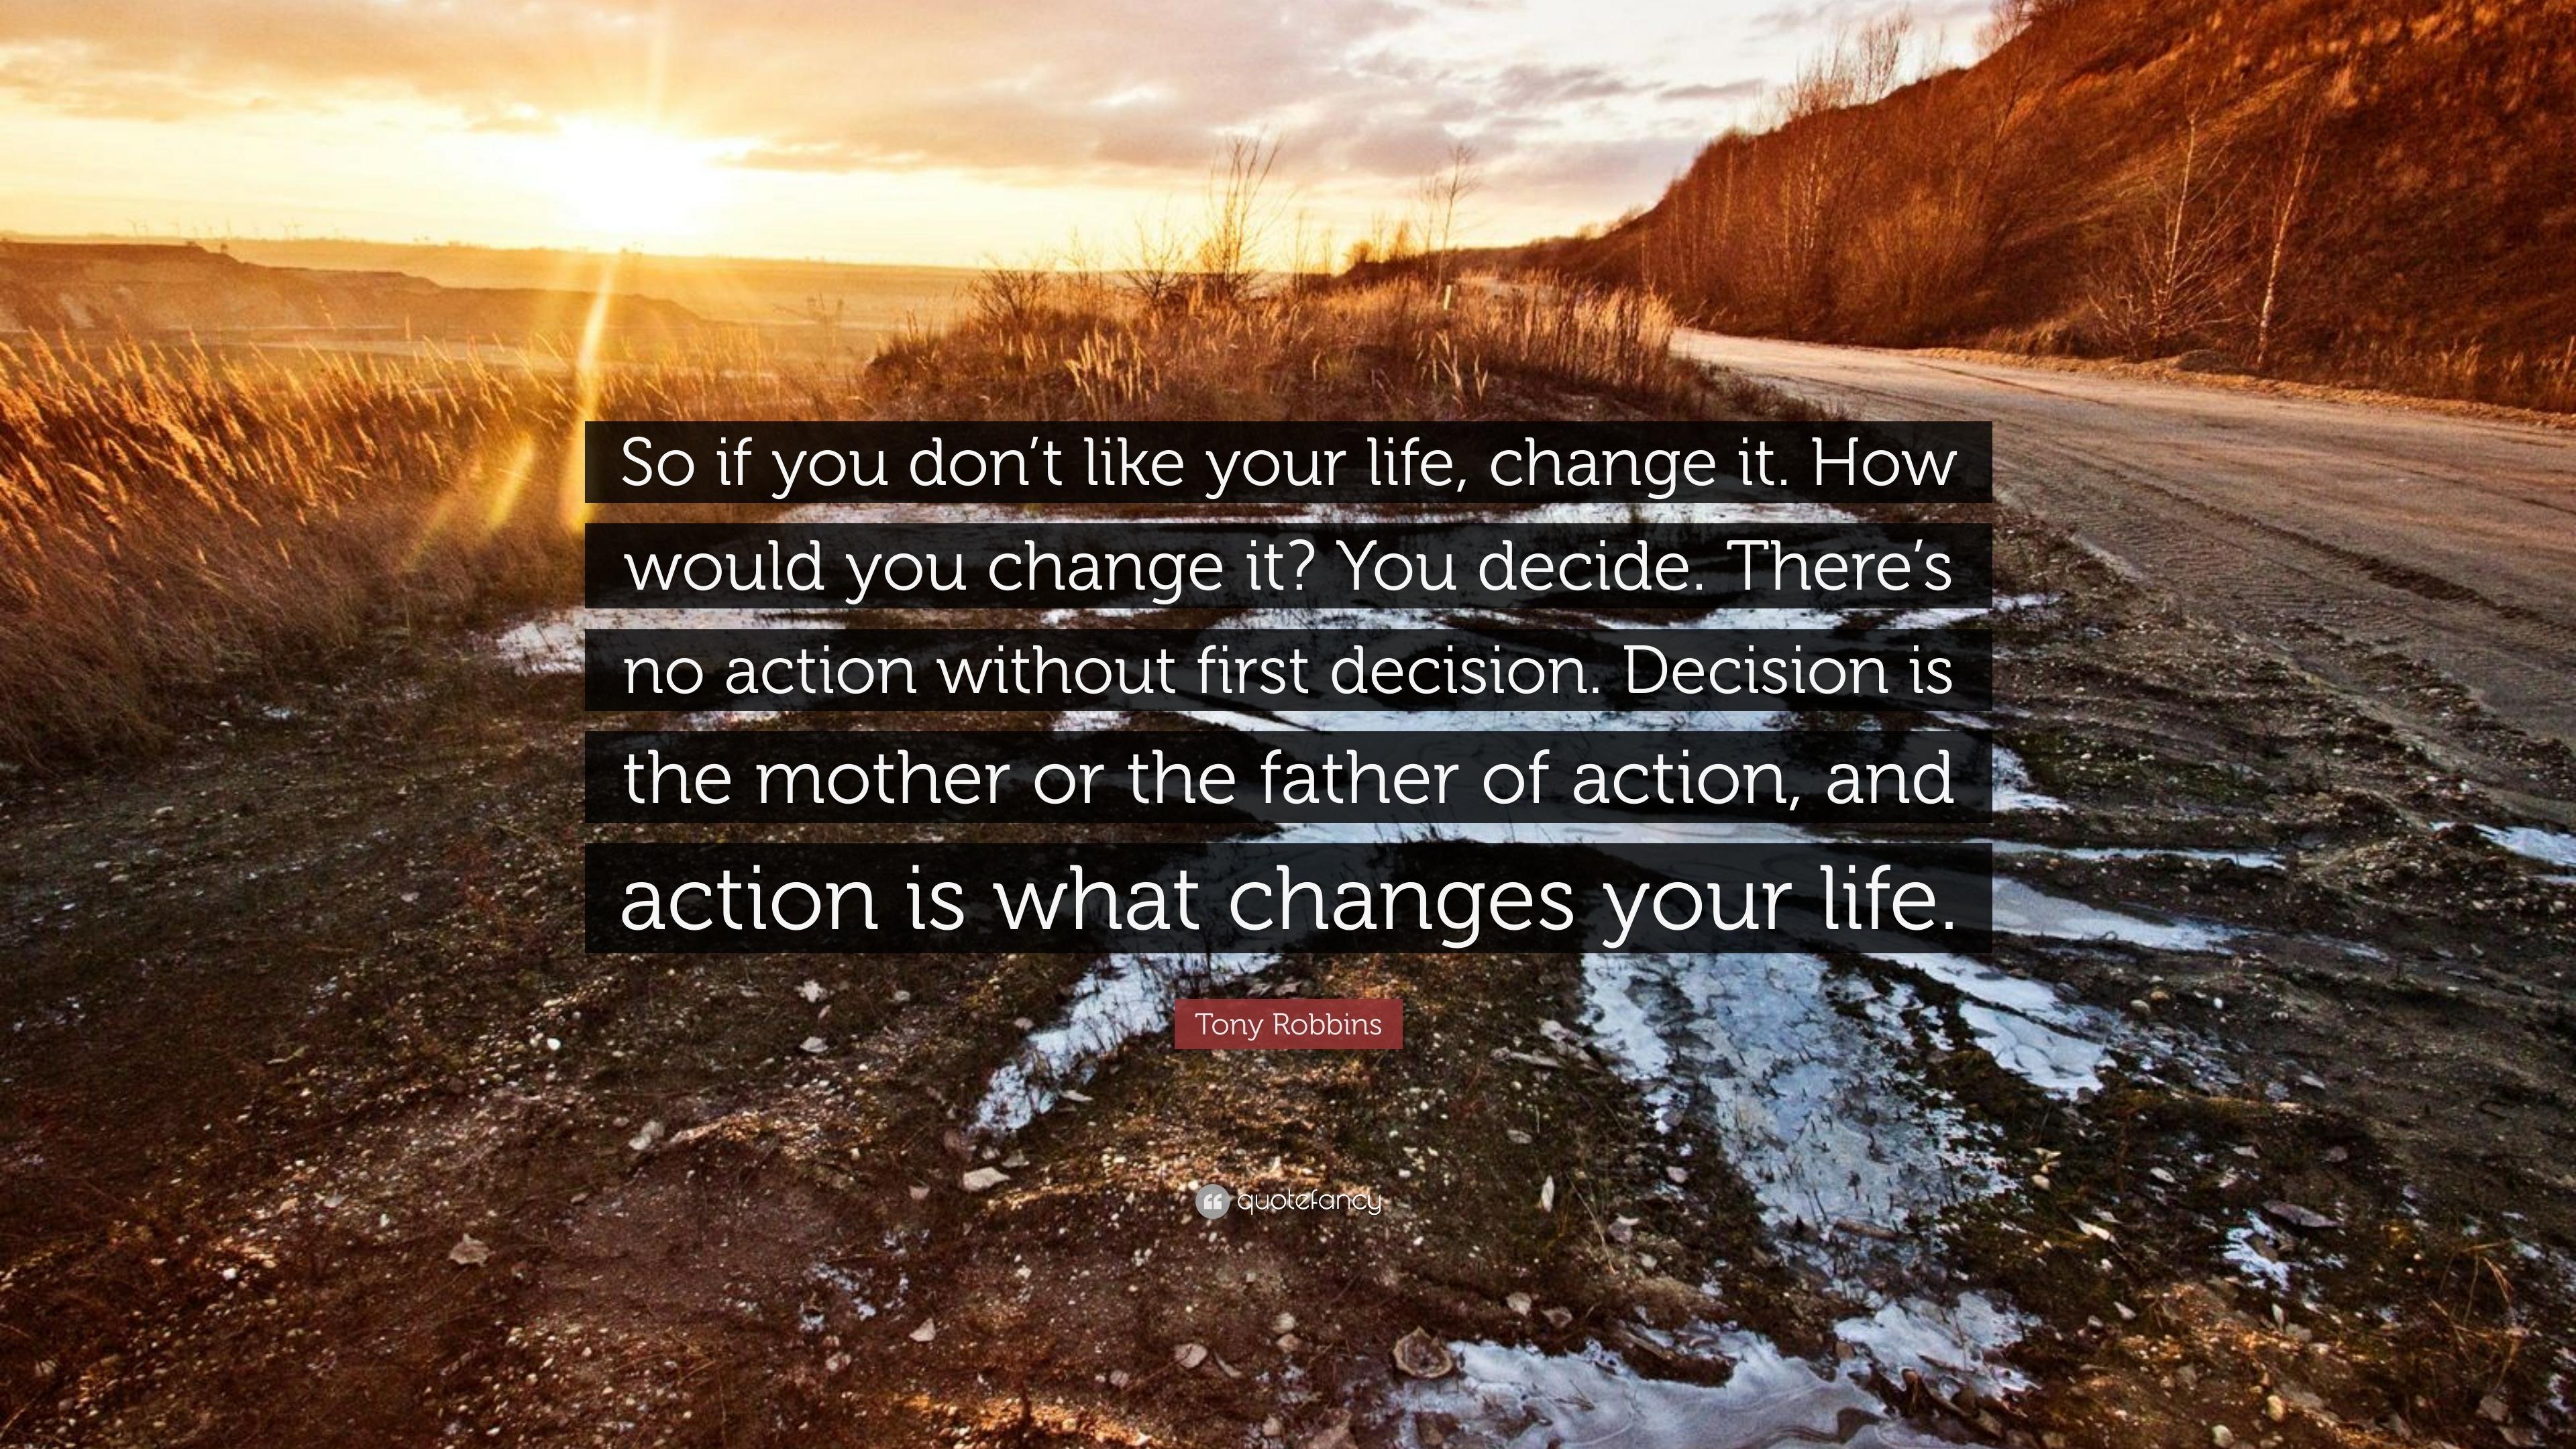 Tony Robbins Quote: U201cSo If You Donu0027t Like Your Life, Change